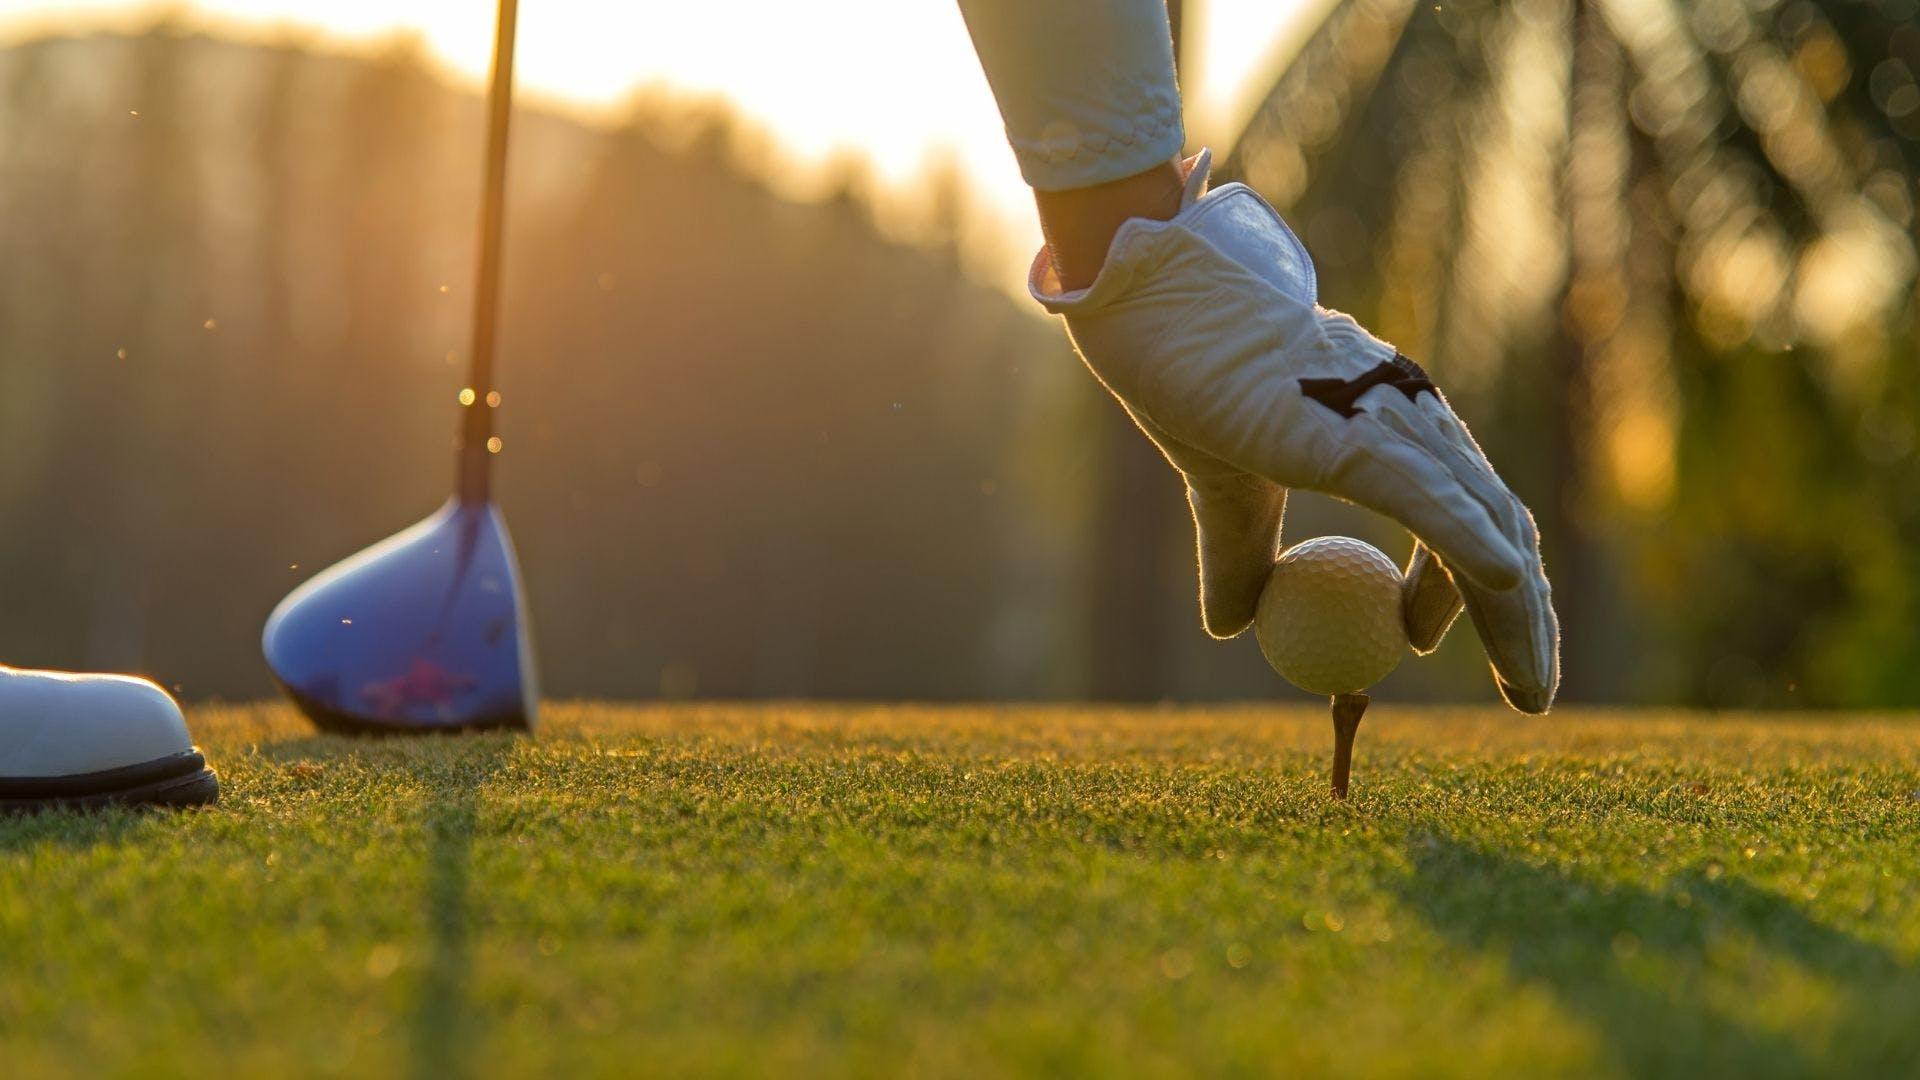 A hand resting a golf ball on a tee